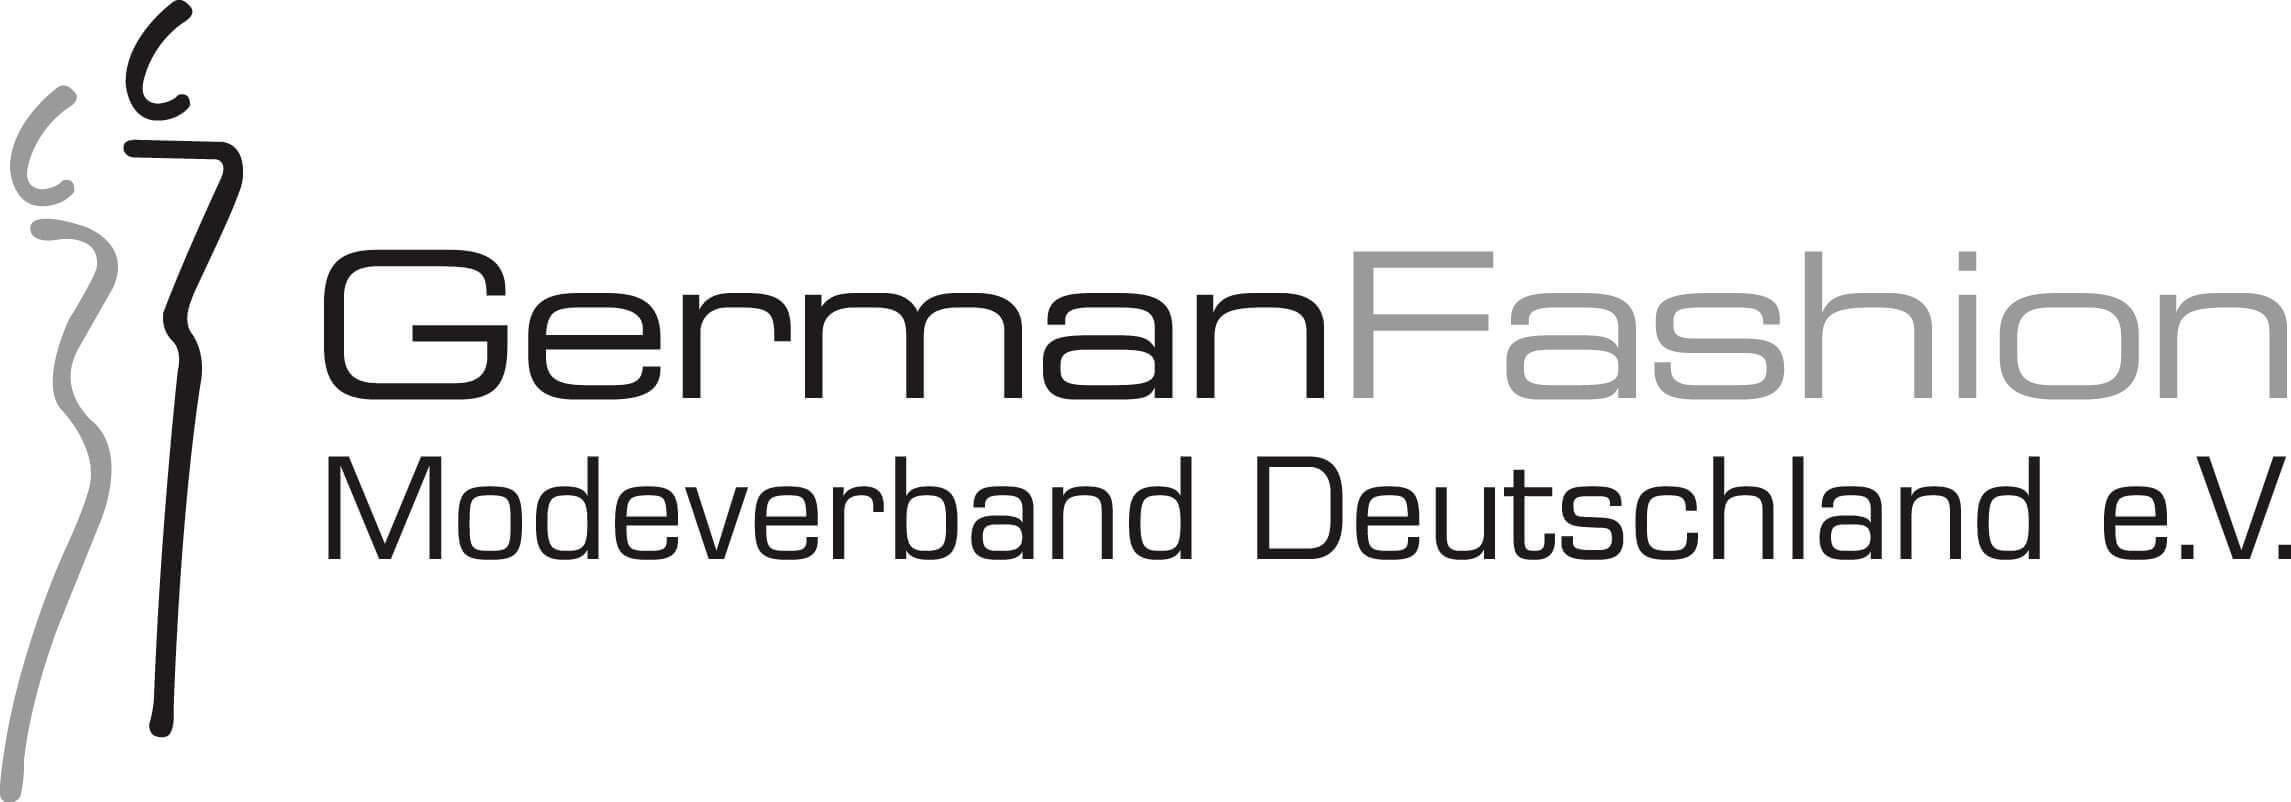 GermanFashion-Modeverband